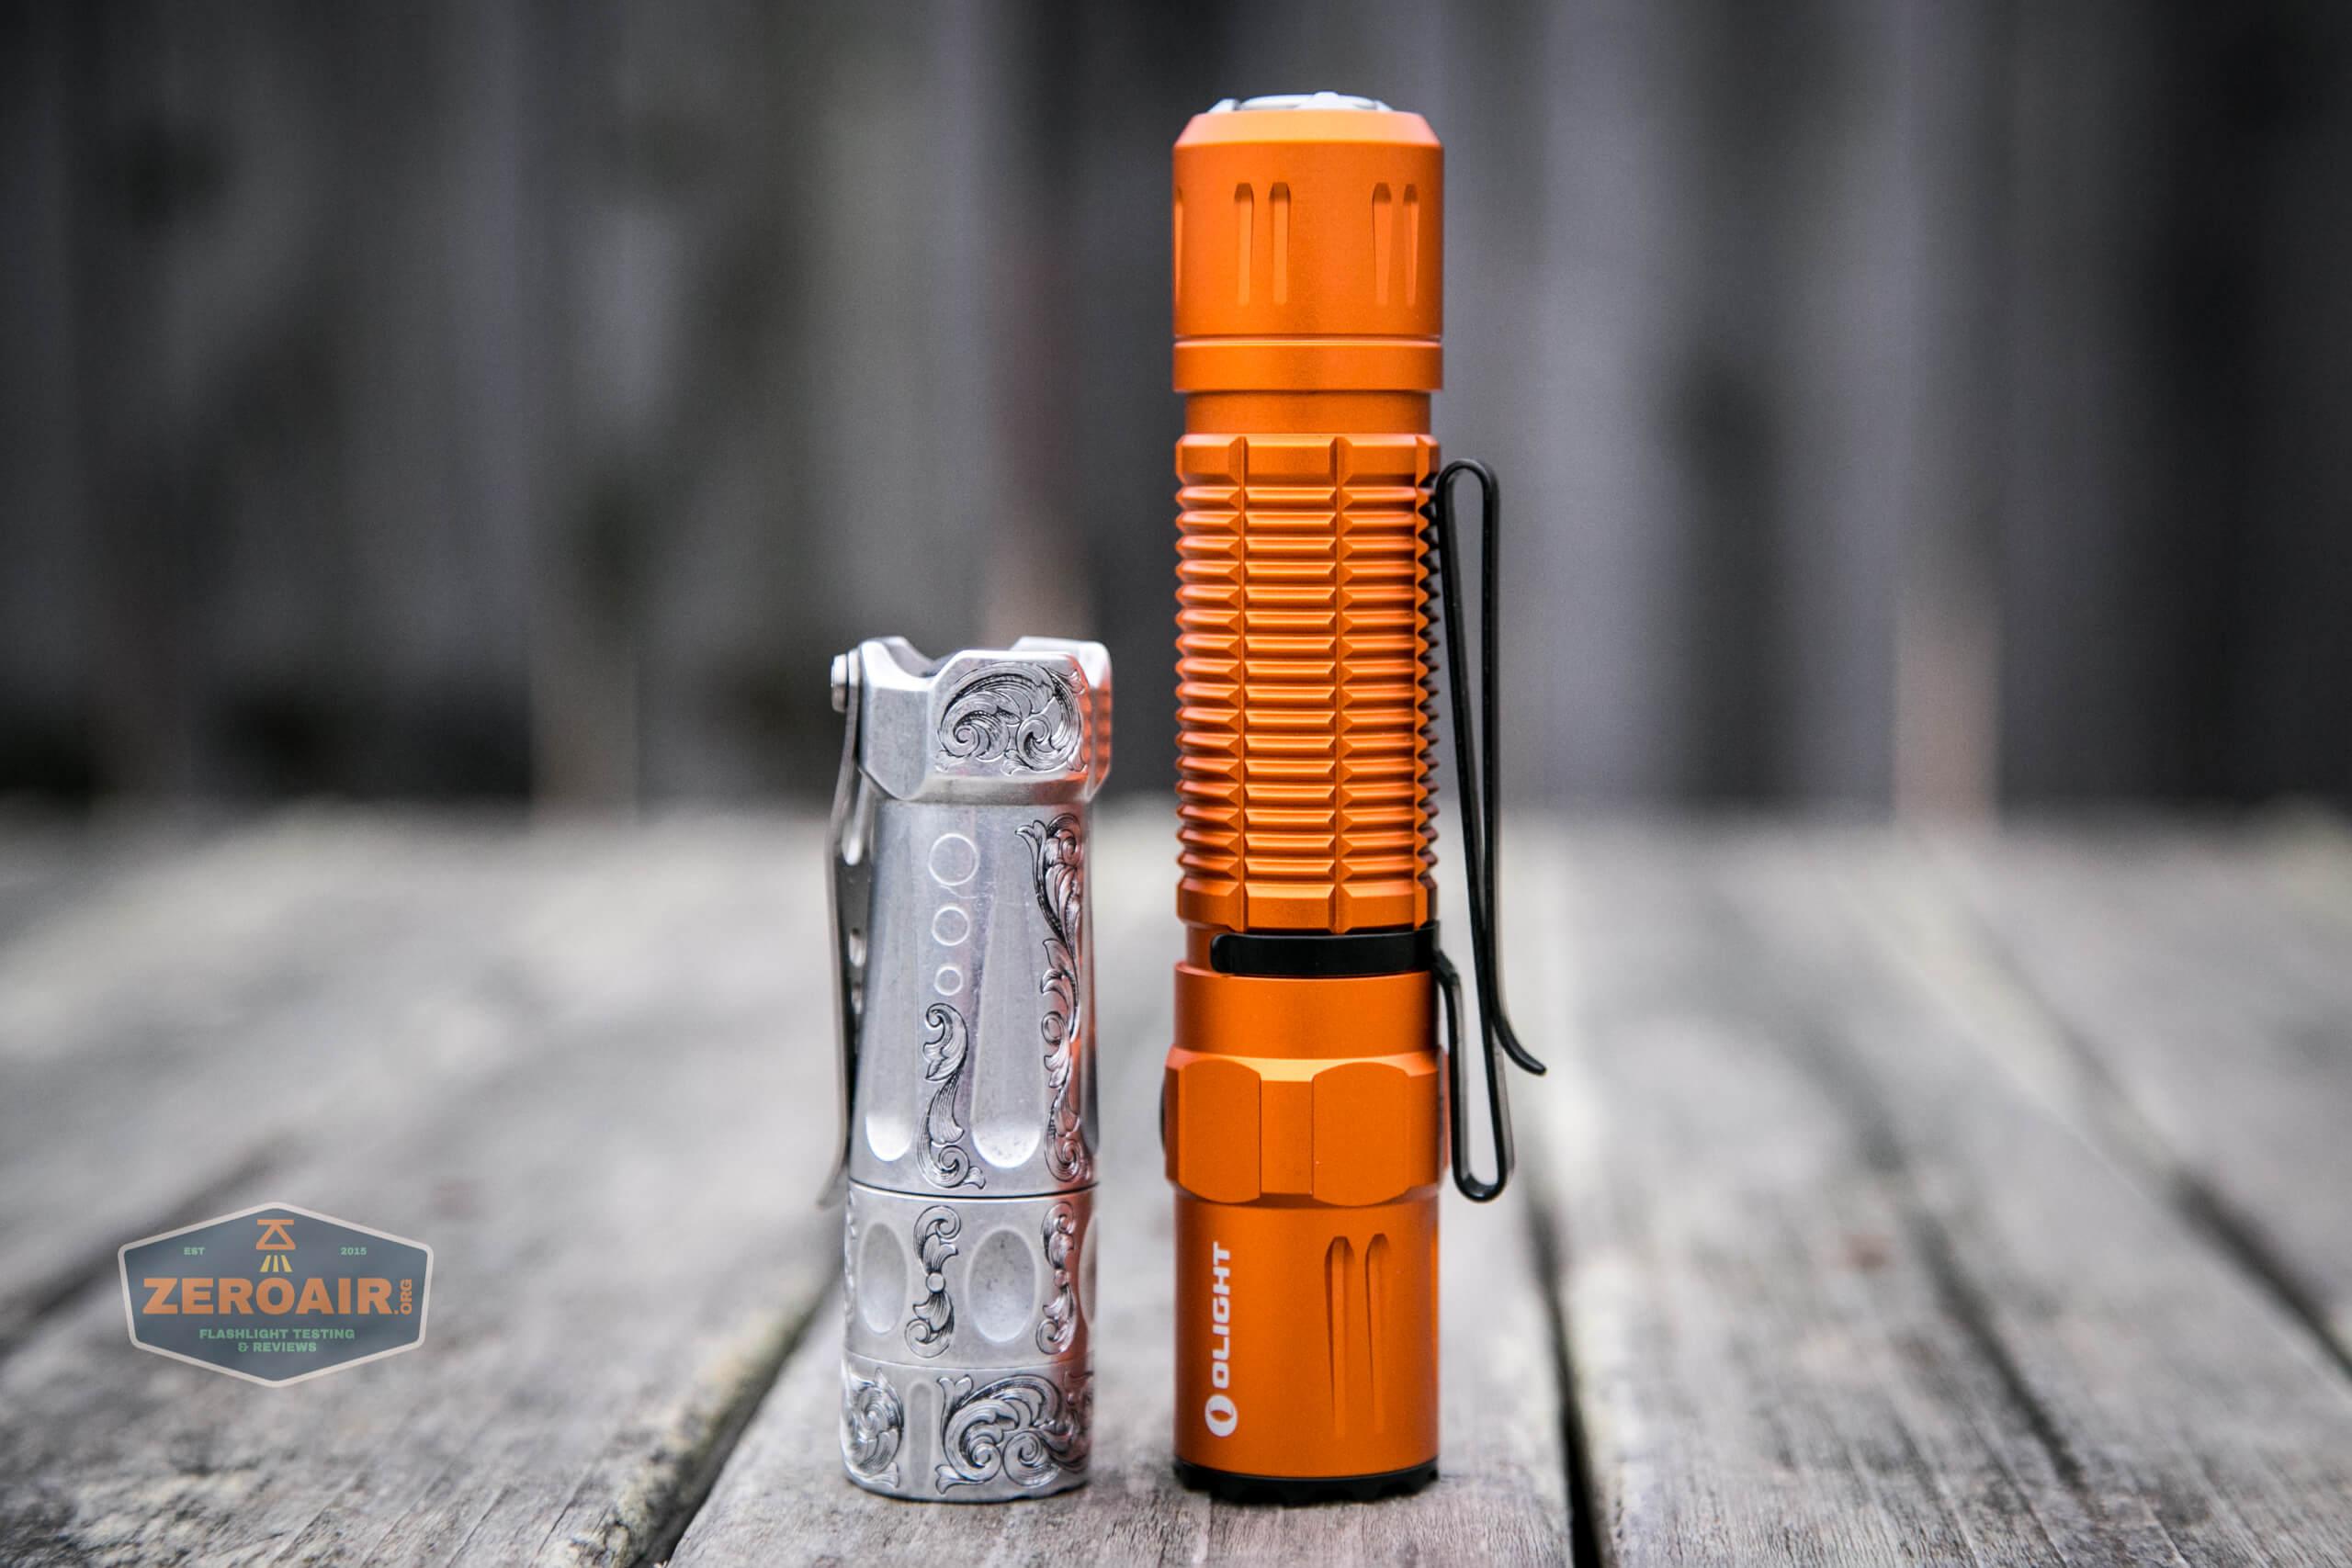 Olight M2R Pro Warrior Orange beside torchlab boss 35